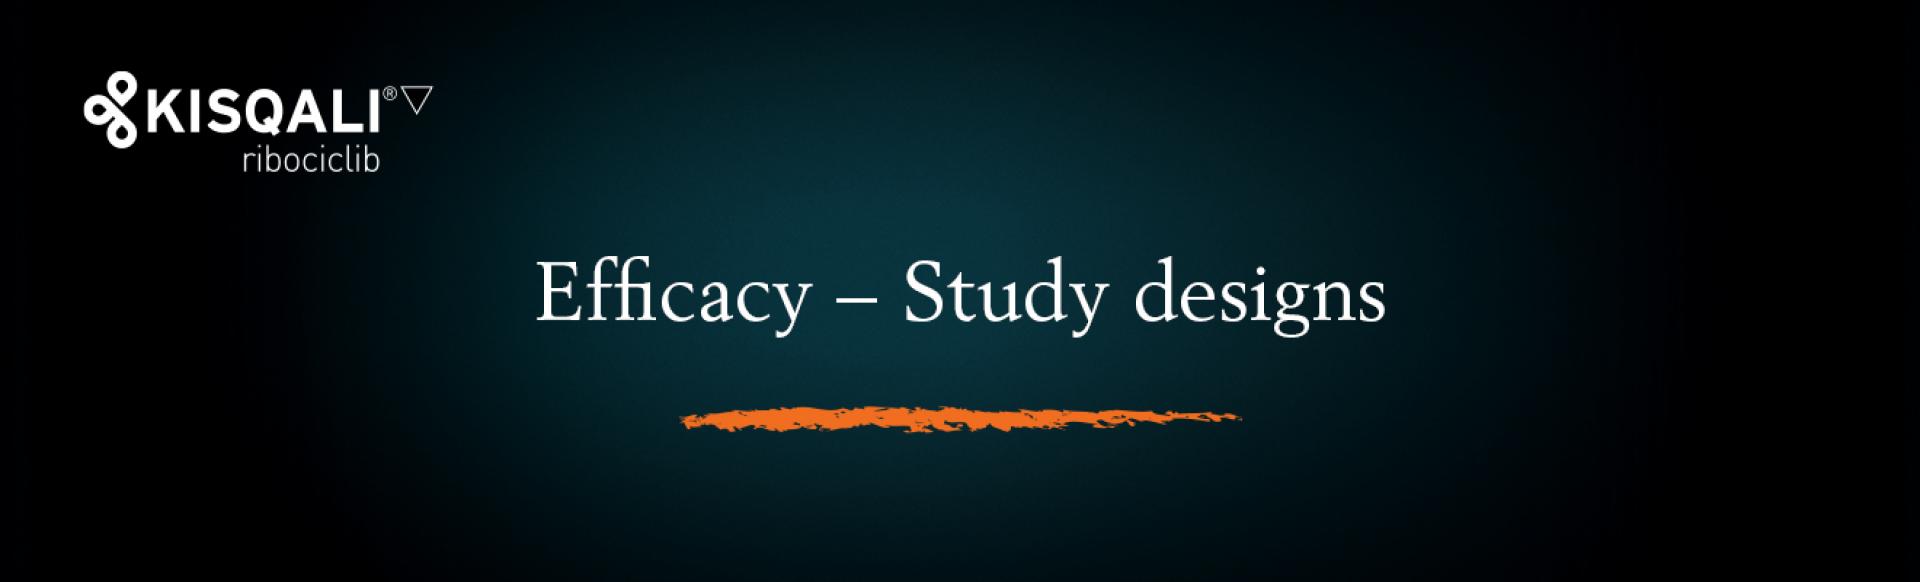 Top banner. Efficacy − Study designs